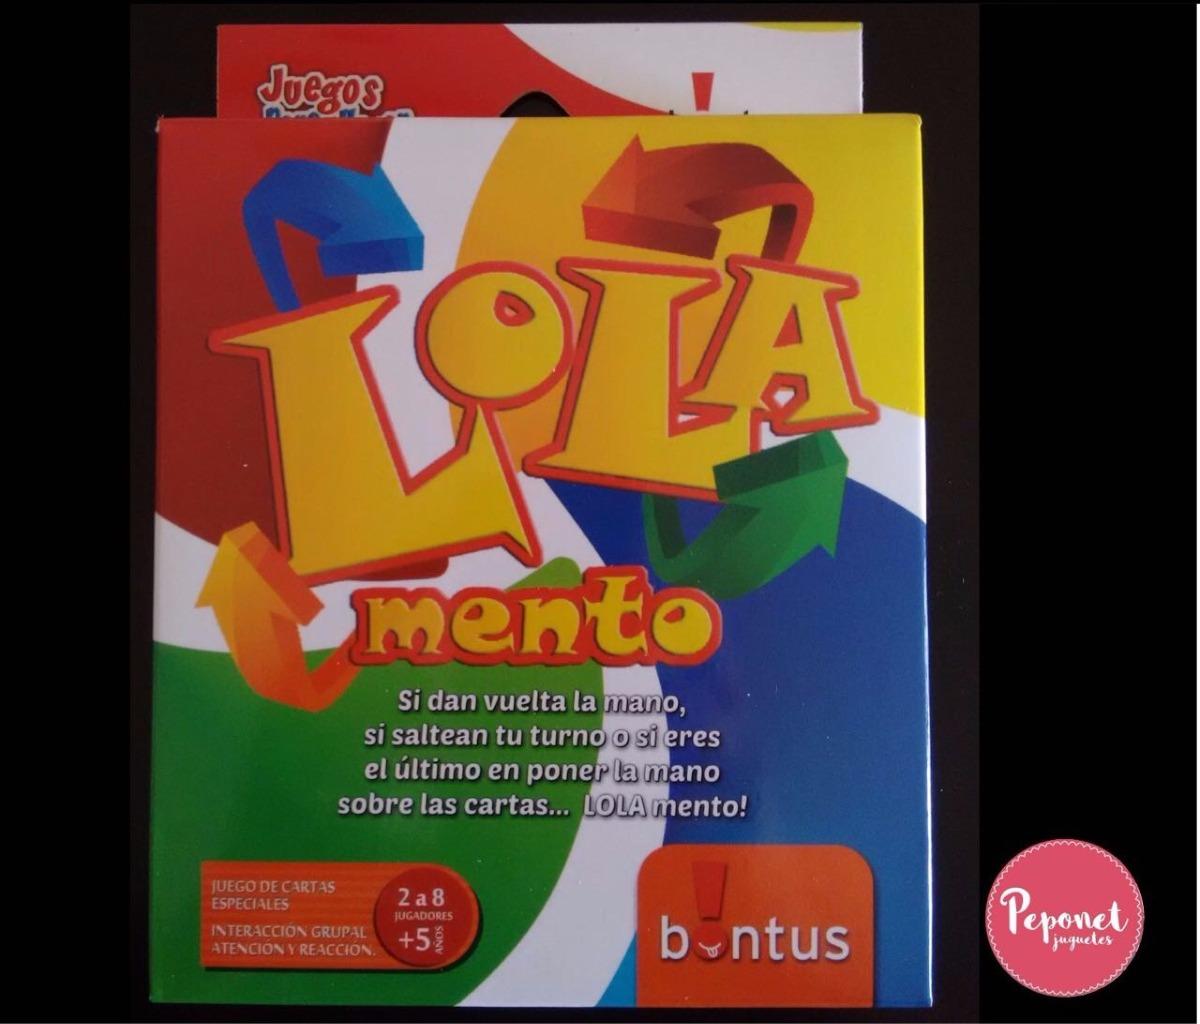 Juego De Cartas Lola Mento 100 00 En Mercado Libre